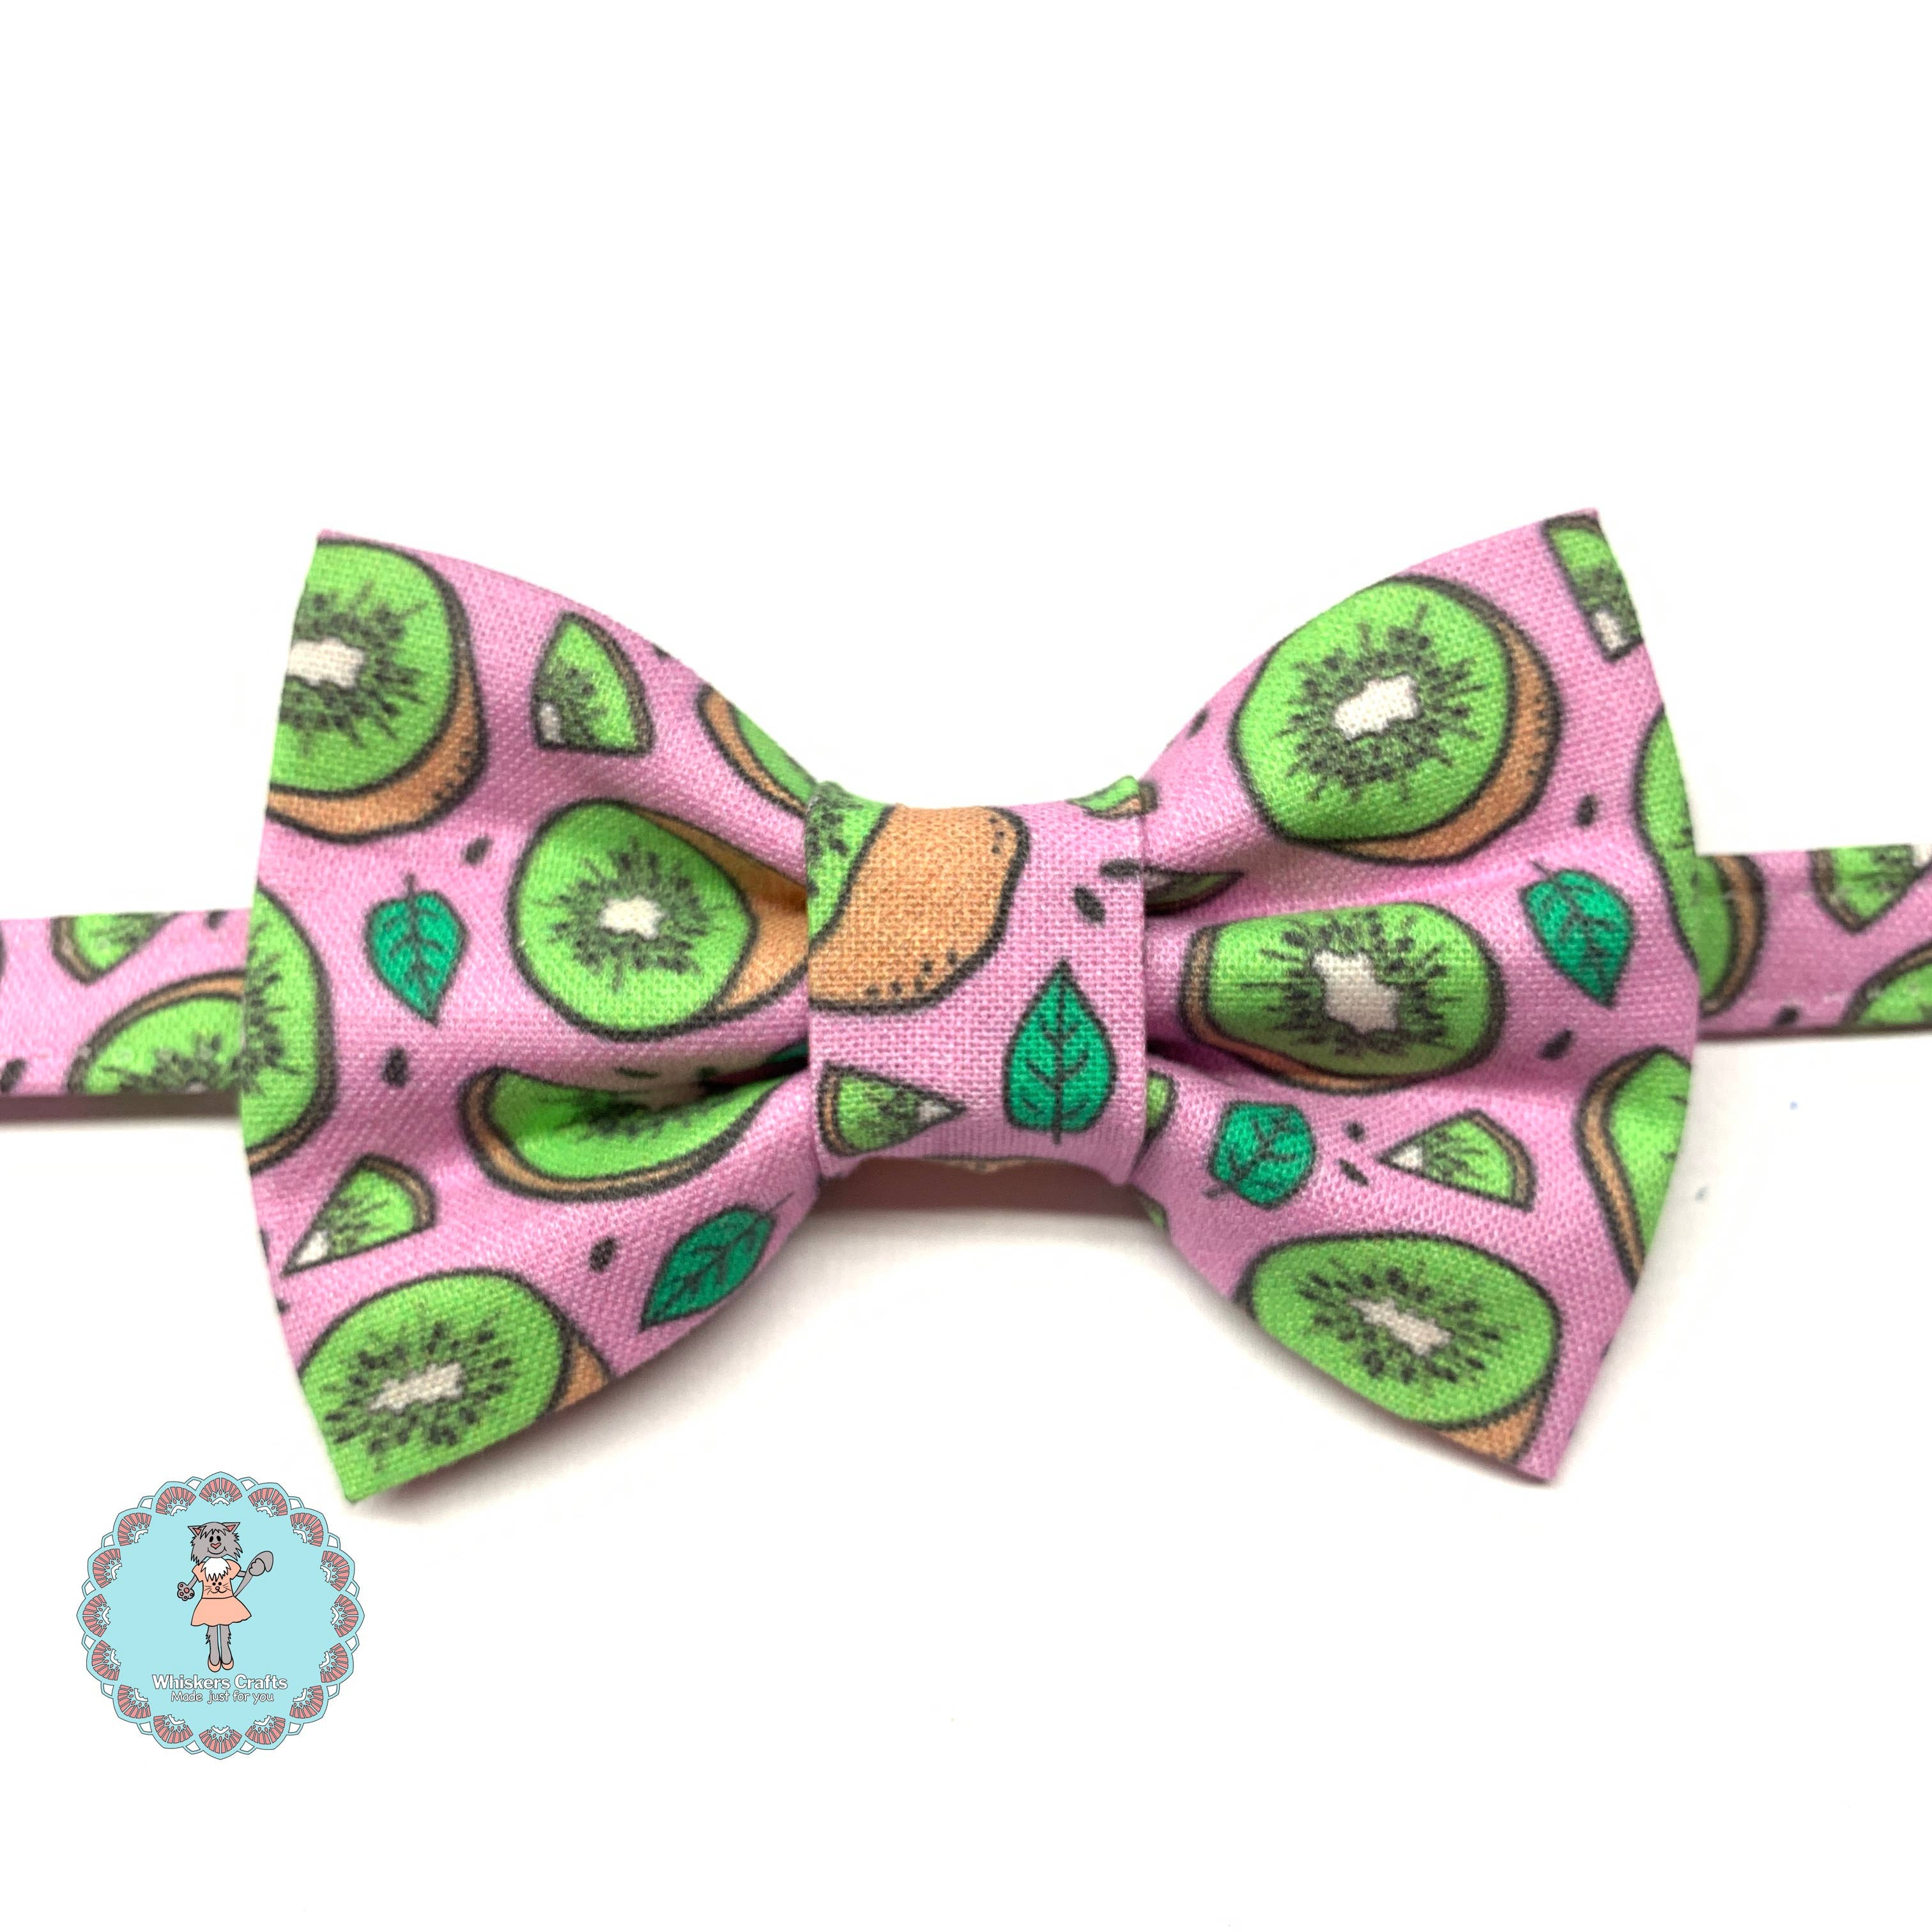 Purple dog bow tie collar Pet wedding Lavender heart charm birthday gift Polka dots